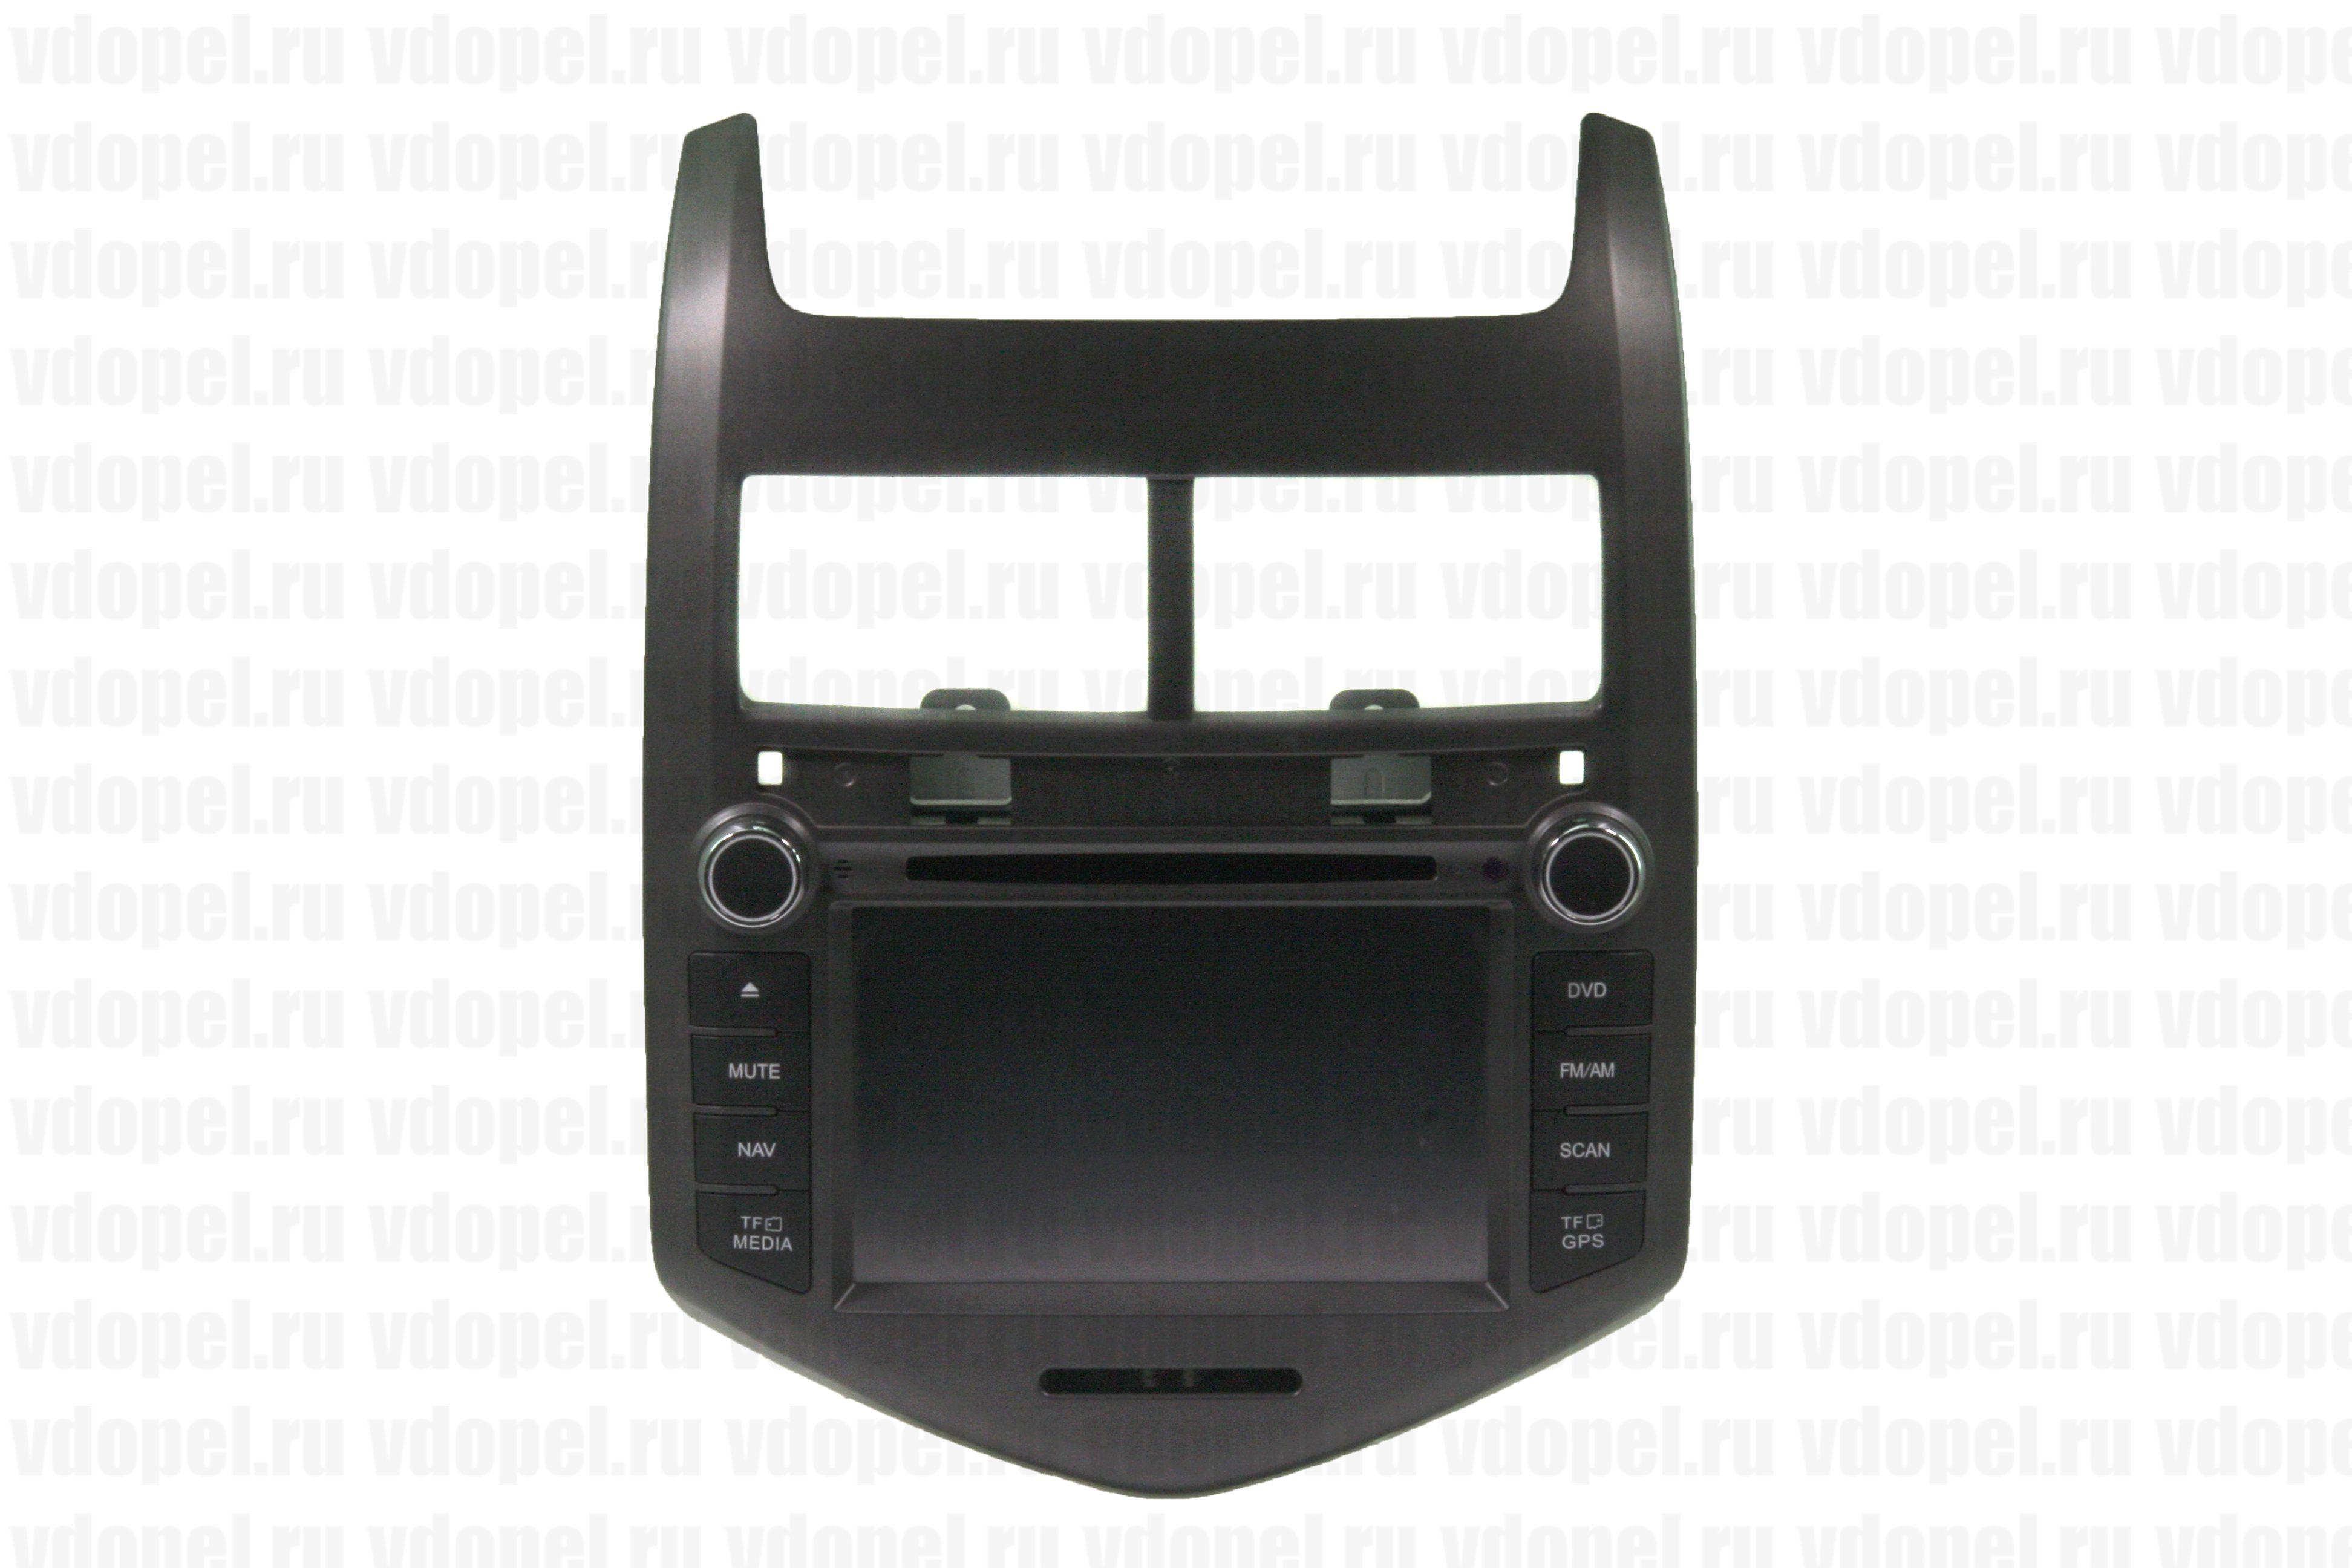 GM DVM3720AVE  - Автомагнитола Phantom DVM-3720G i6 Chevrolet Aveo 2012- с навигацией